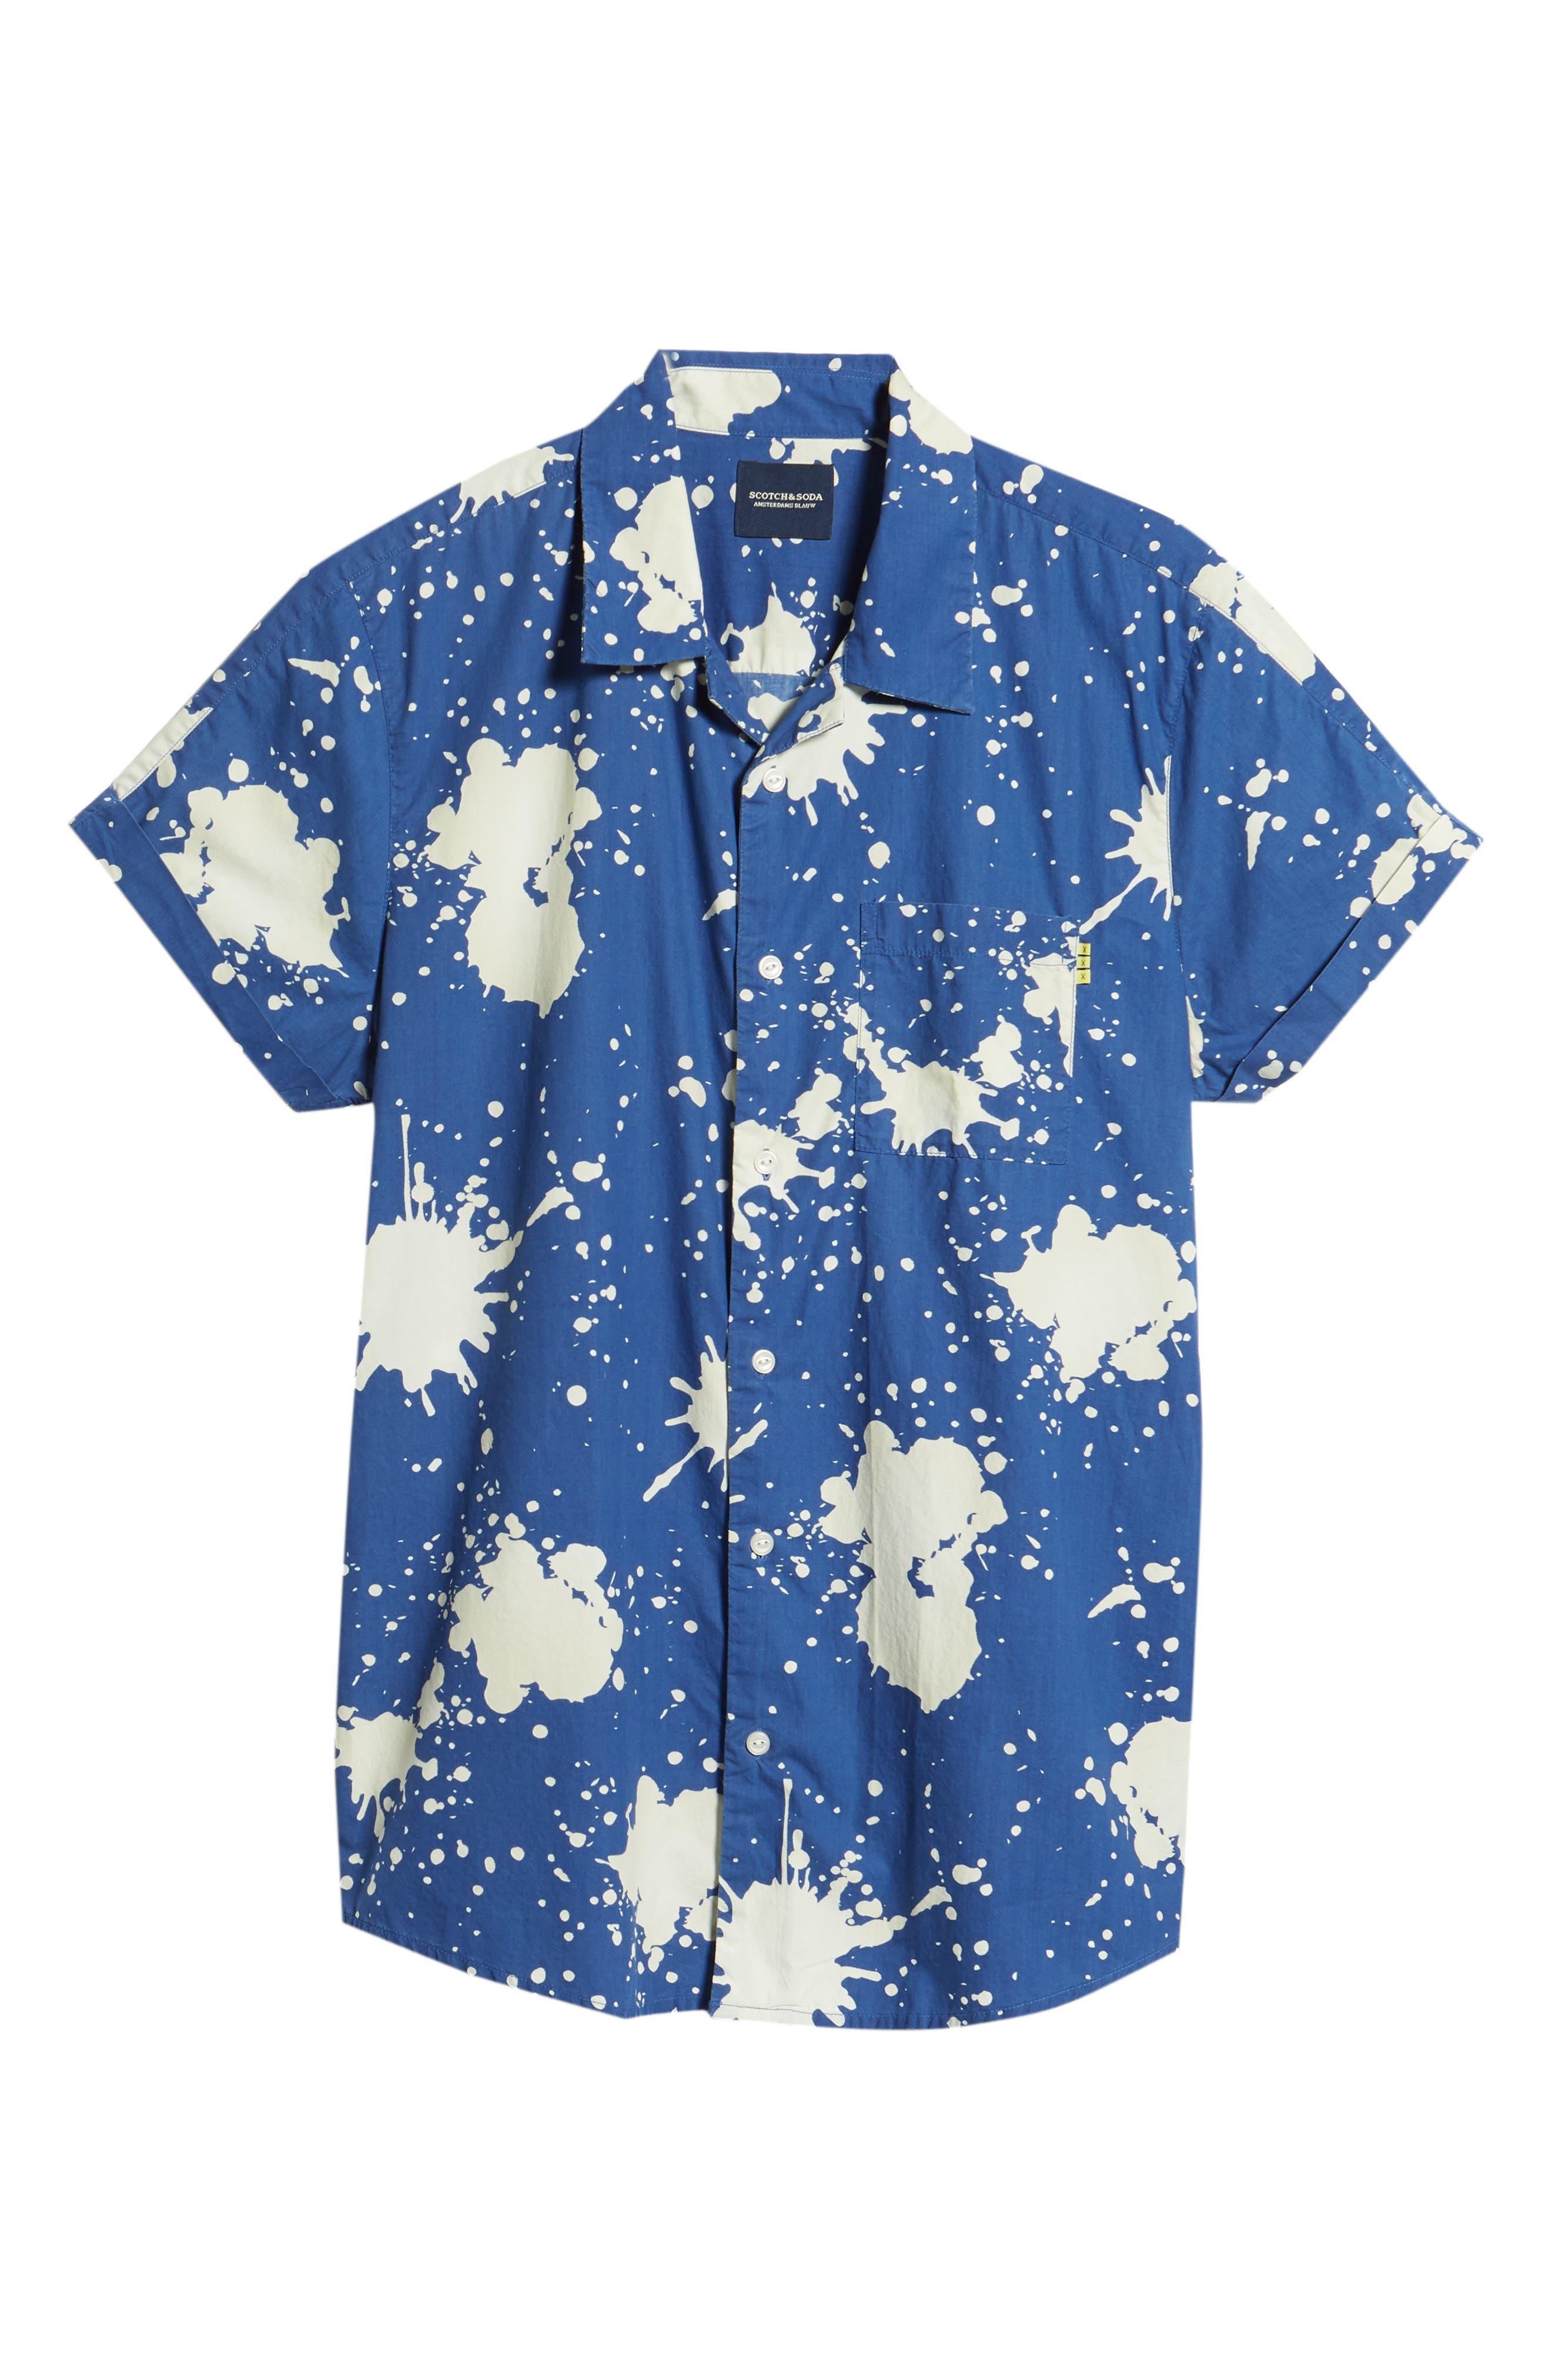 Amsterdams Blauw Allover Print Camp Shirt,                             Alternate thumbnail 6, color,                             BLUE